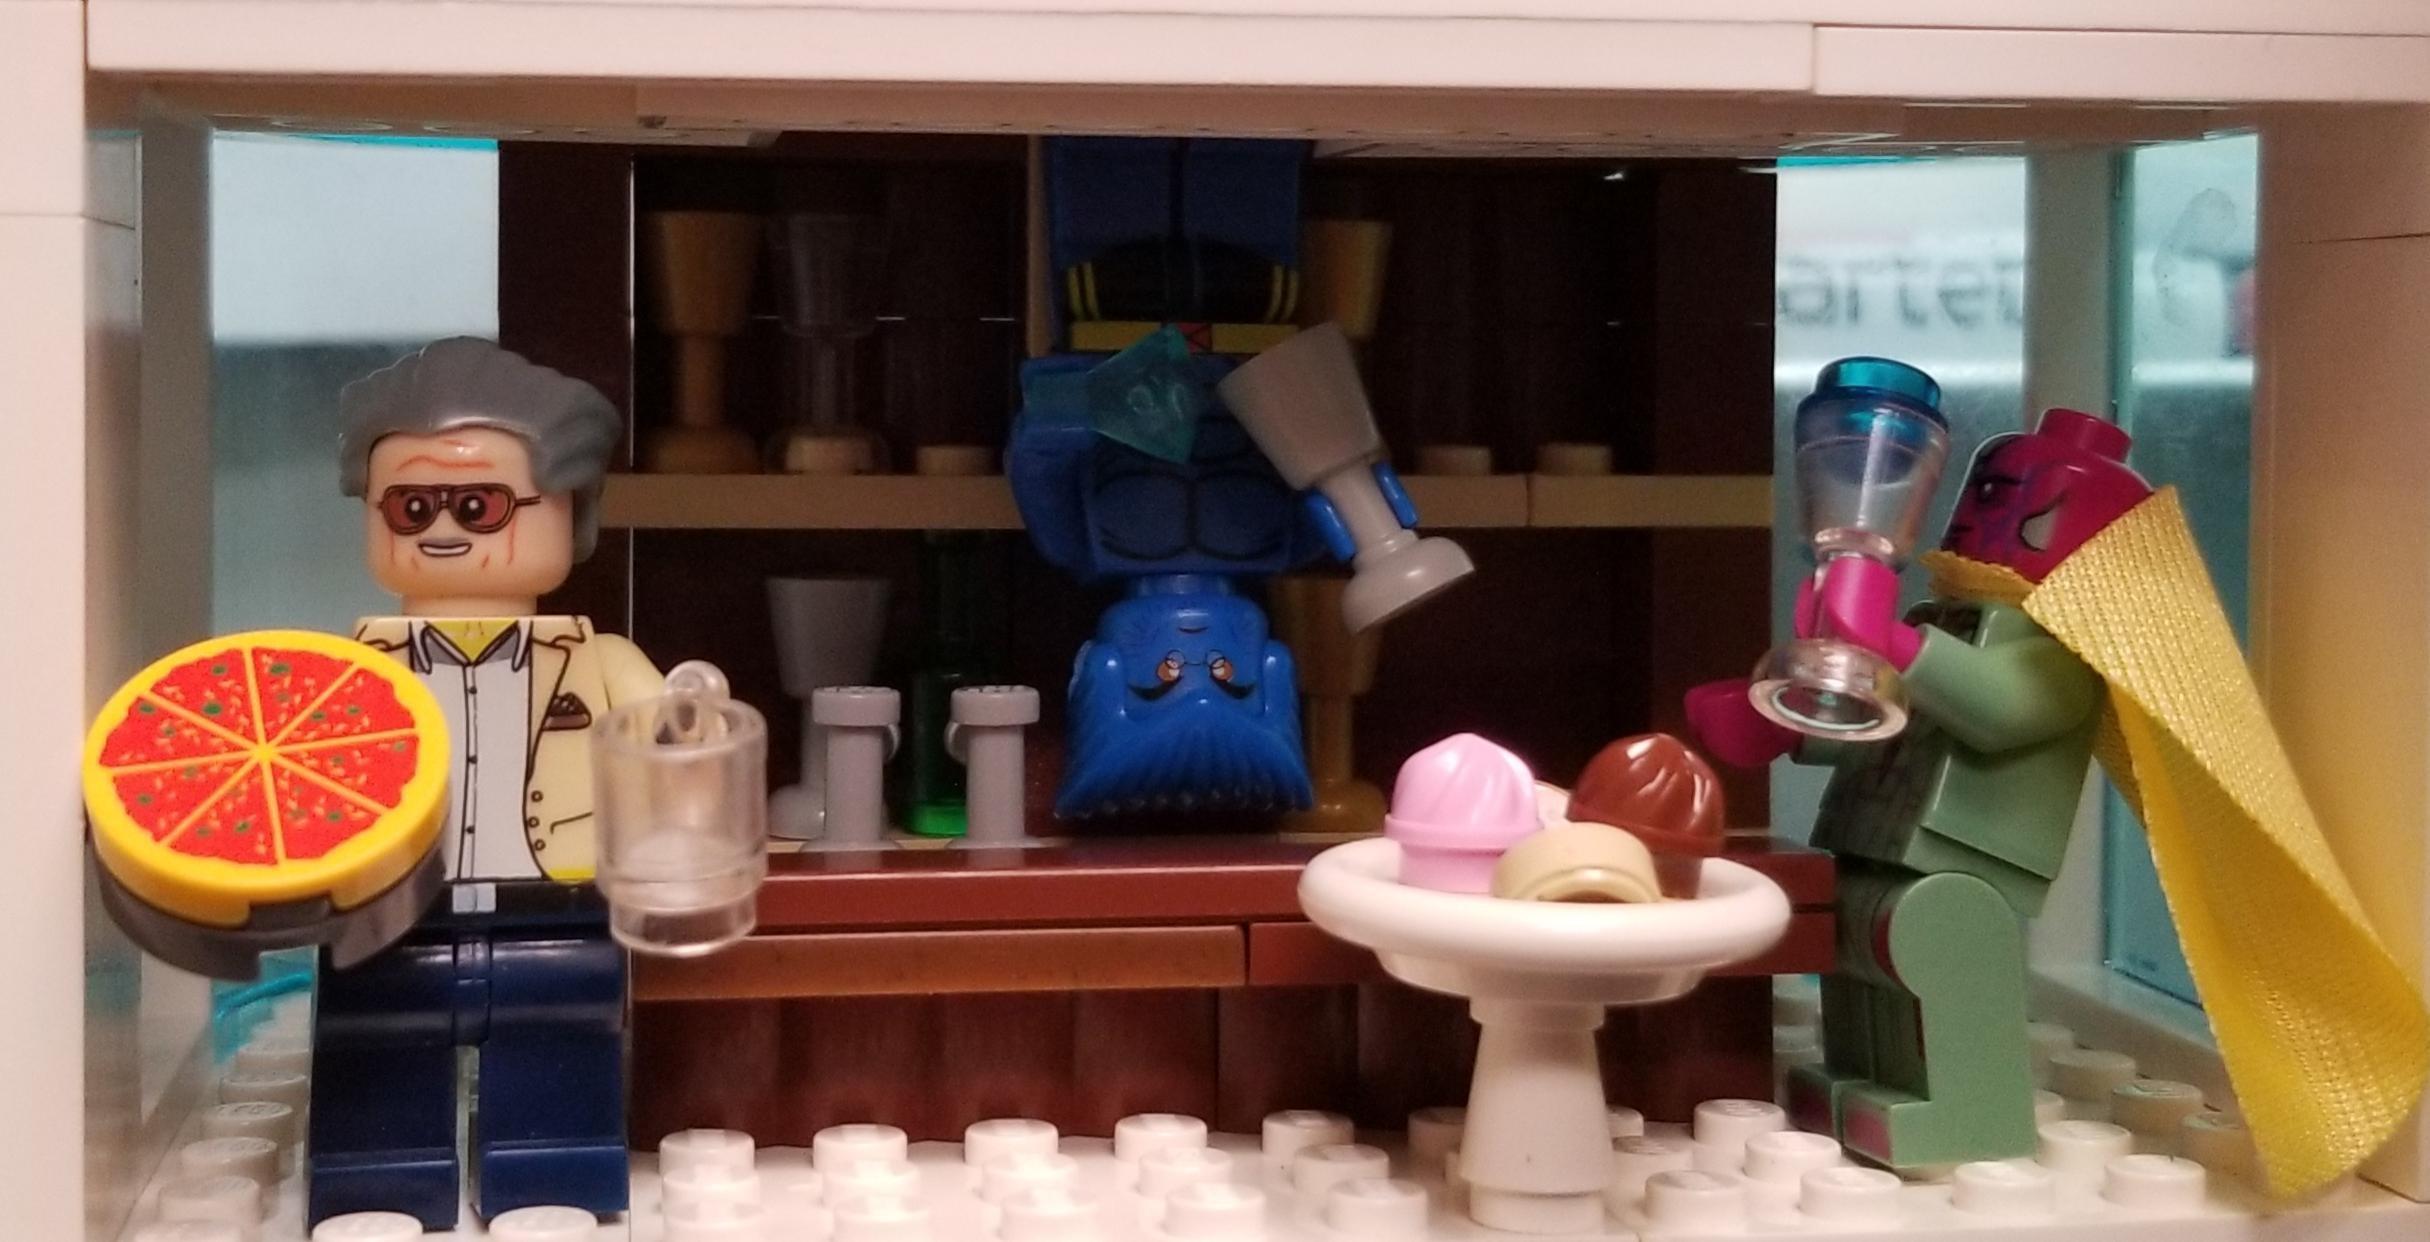 Lego Stan Lee